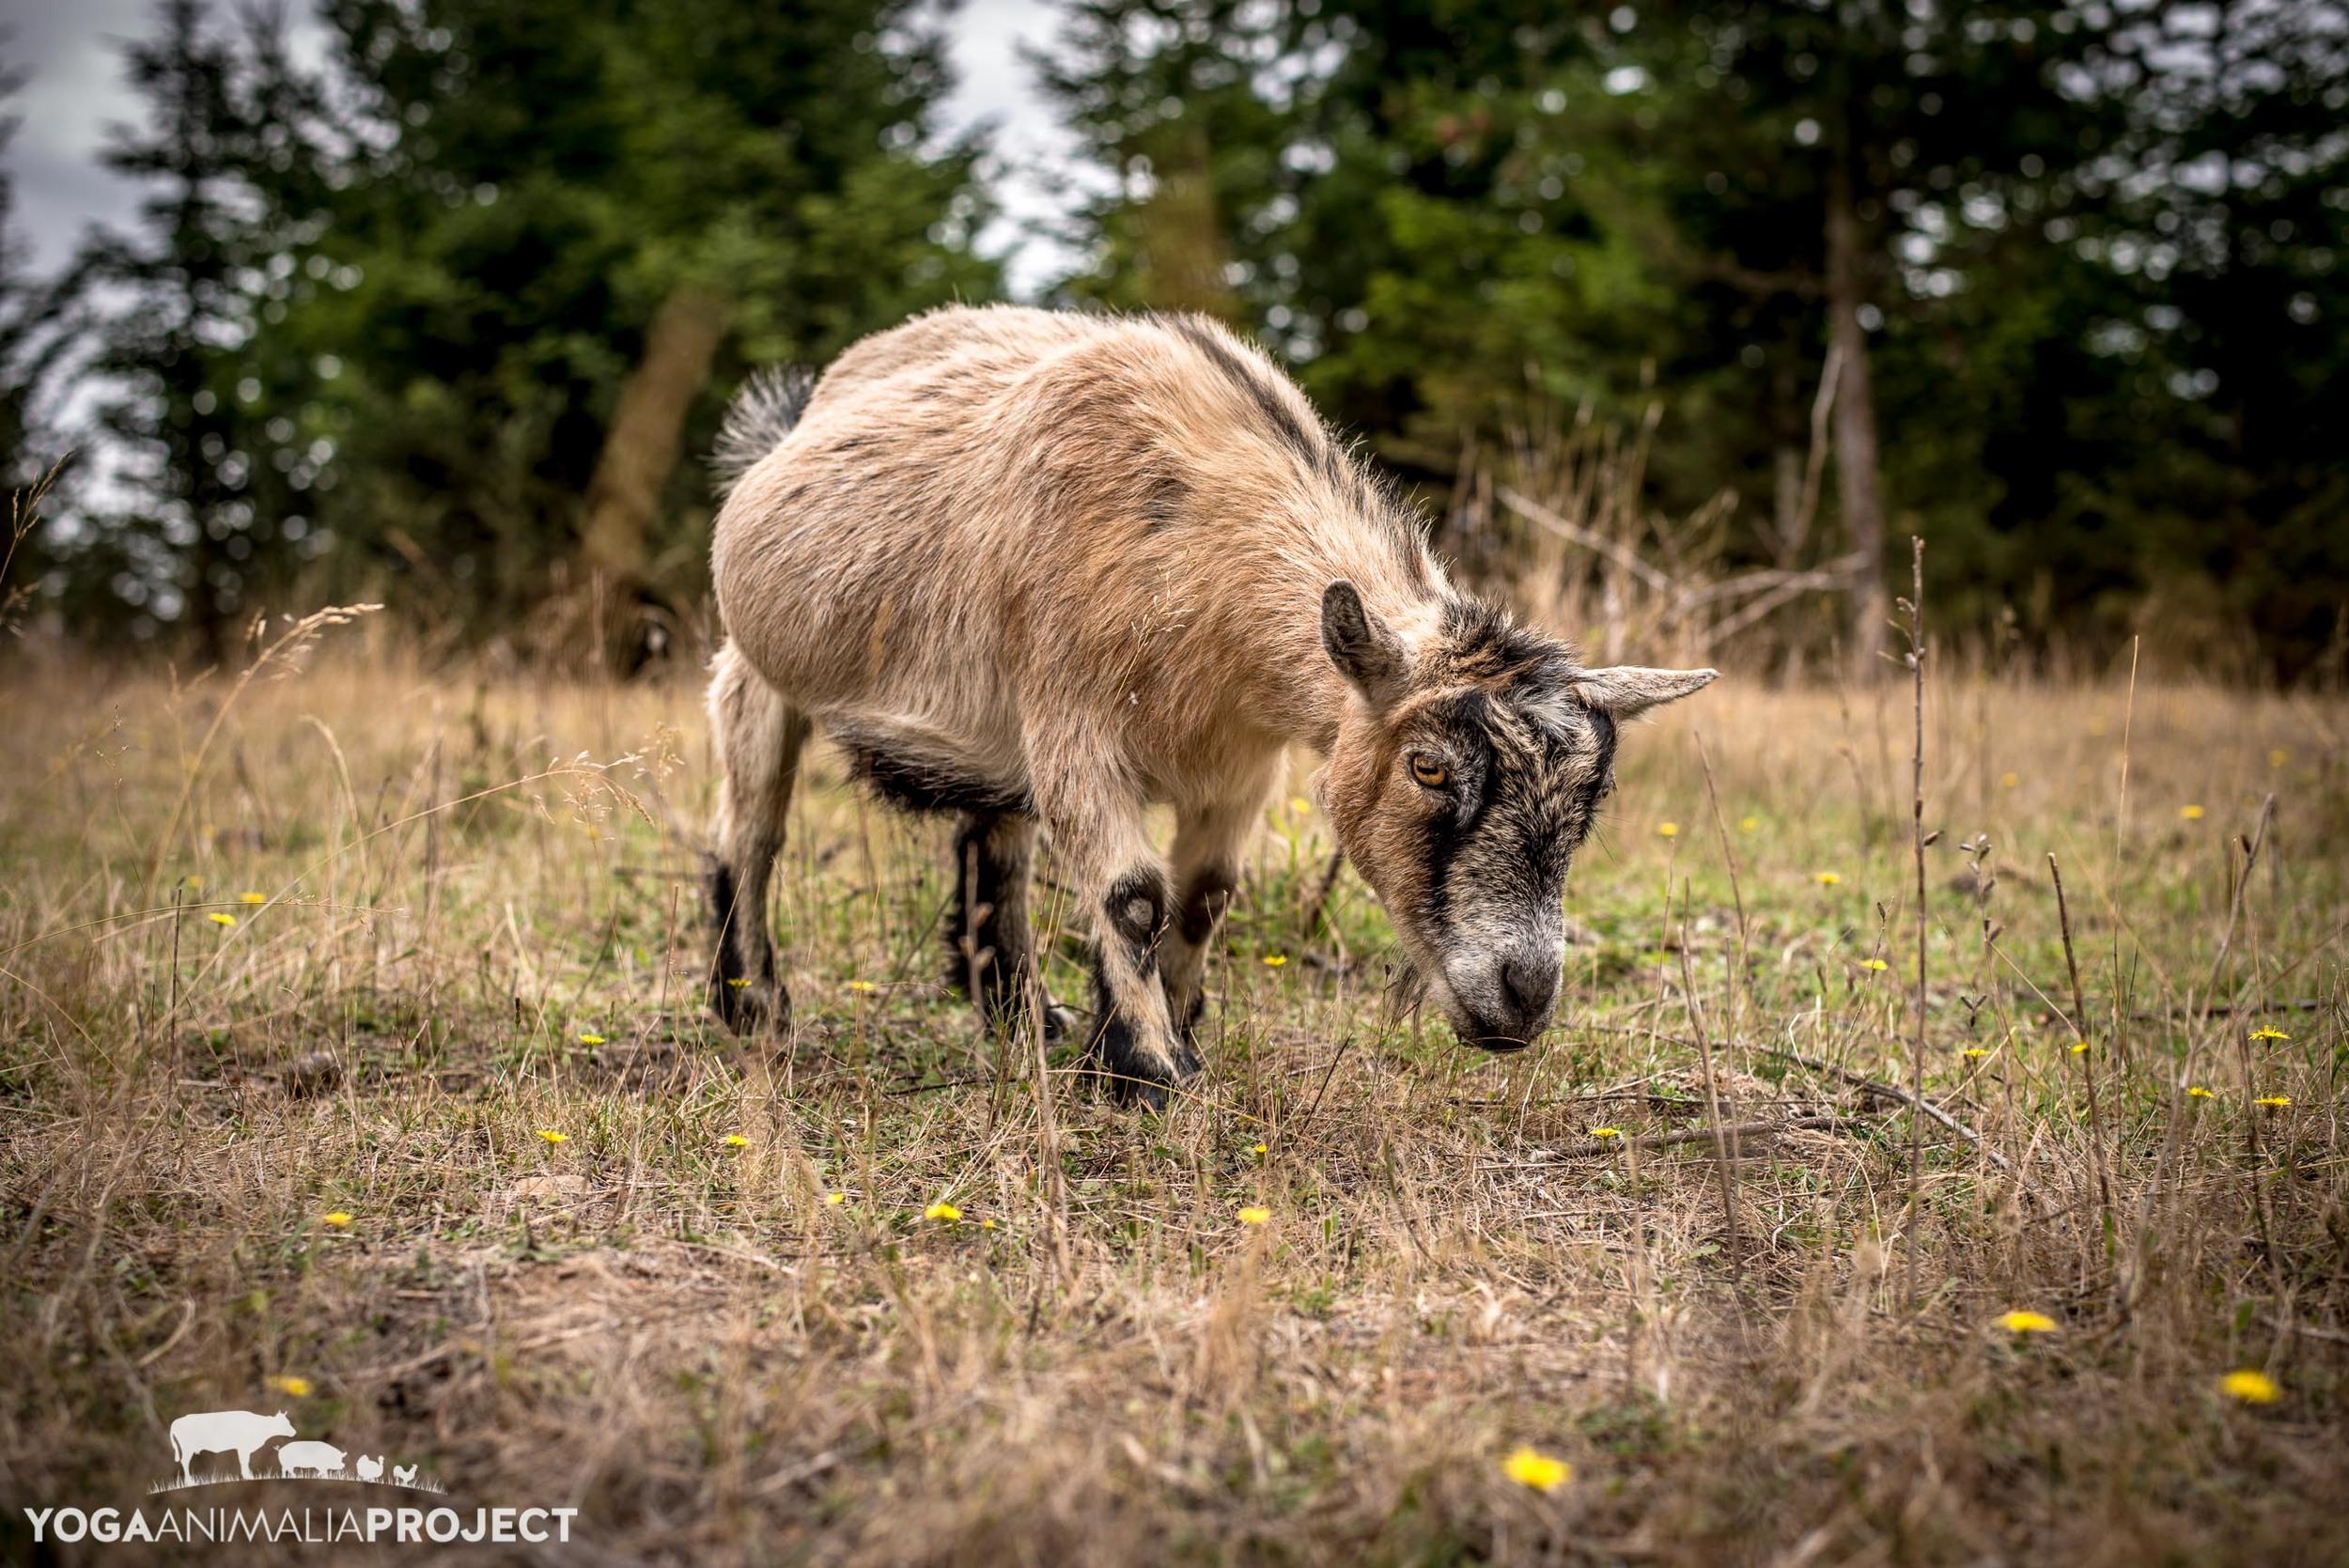 Fauna - the grass was greener until the goats got it, Green Acres Farm Sanctuary, Silverton, Oregon